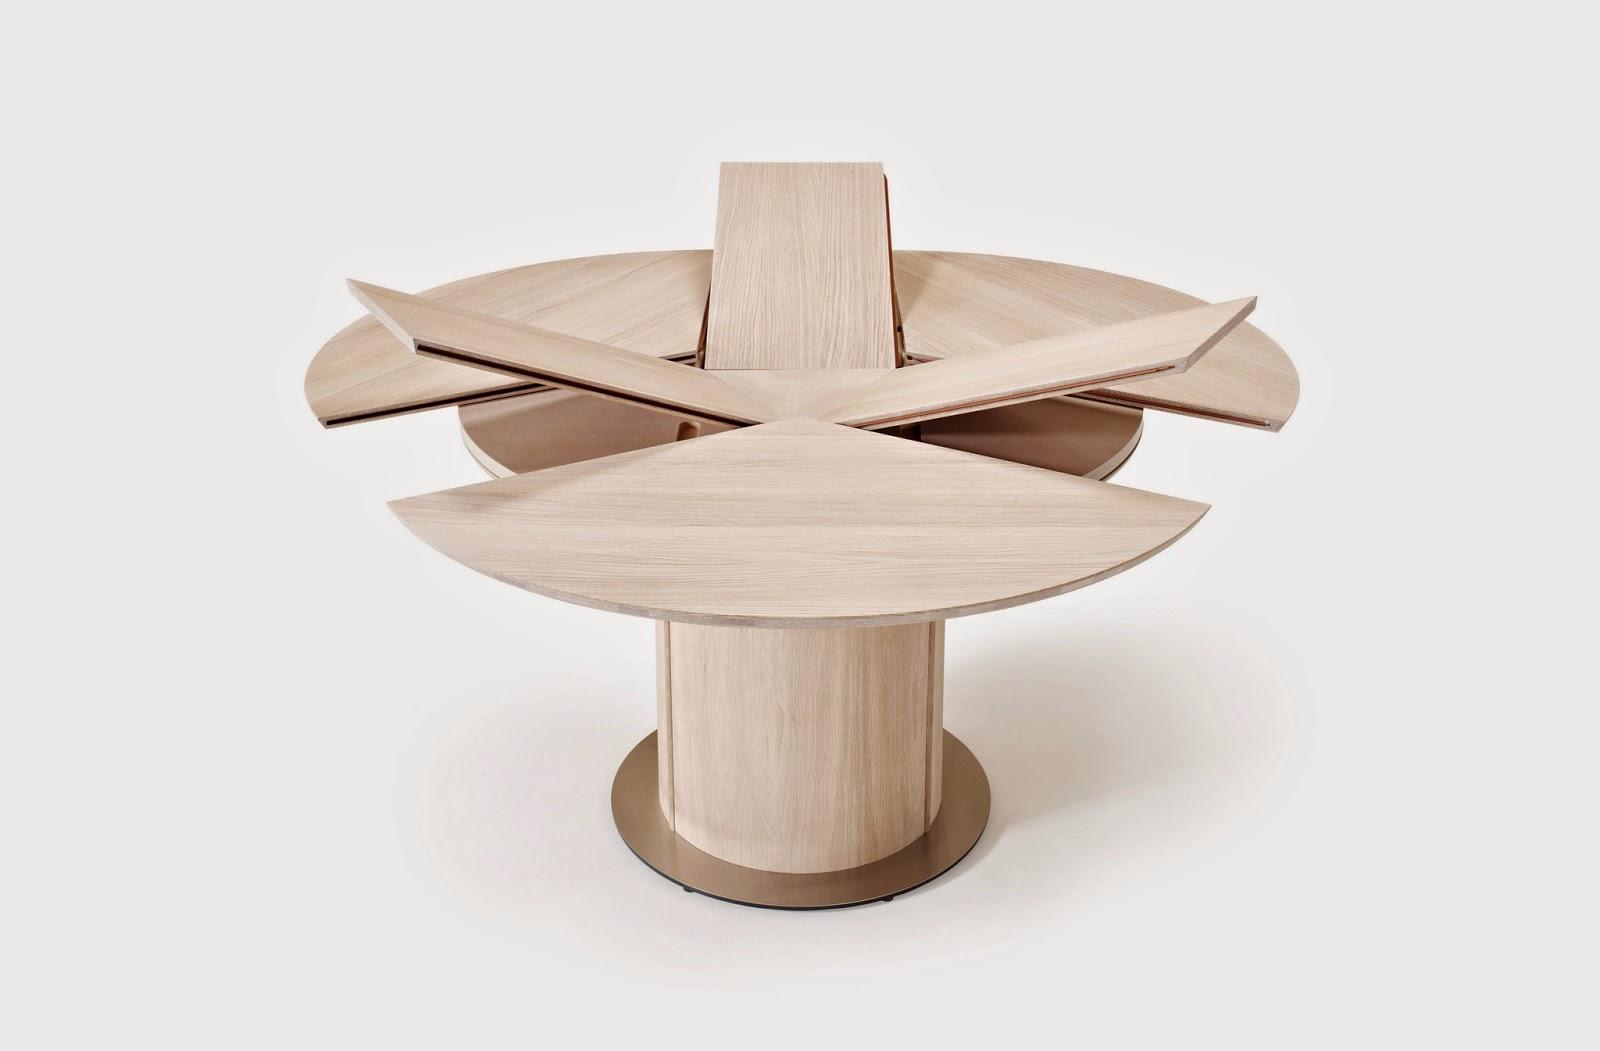 Ronde tafel sm van skovby noordkaap meubelen